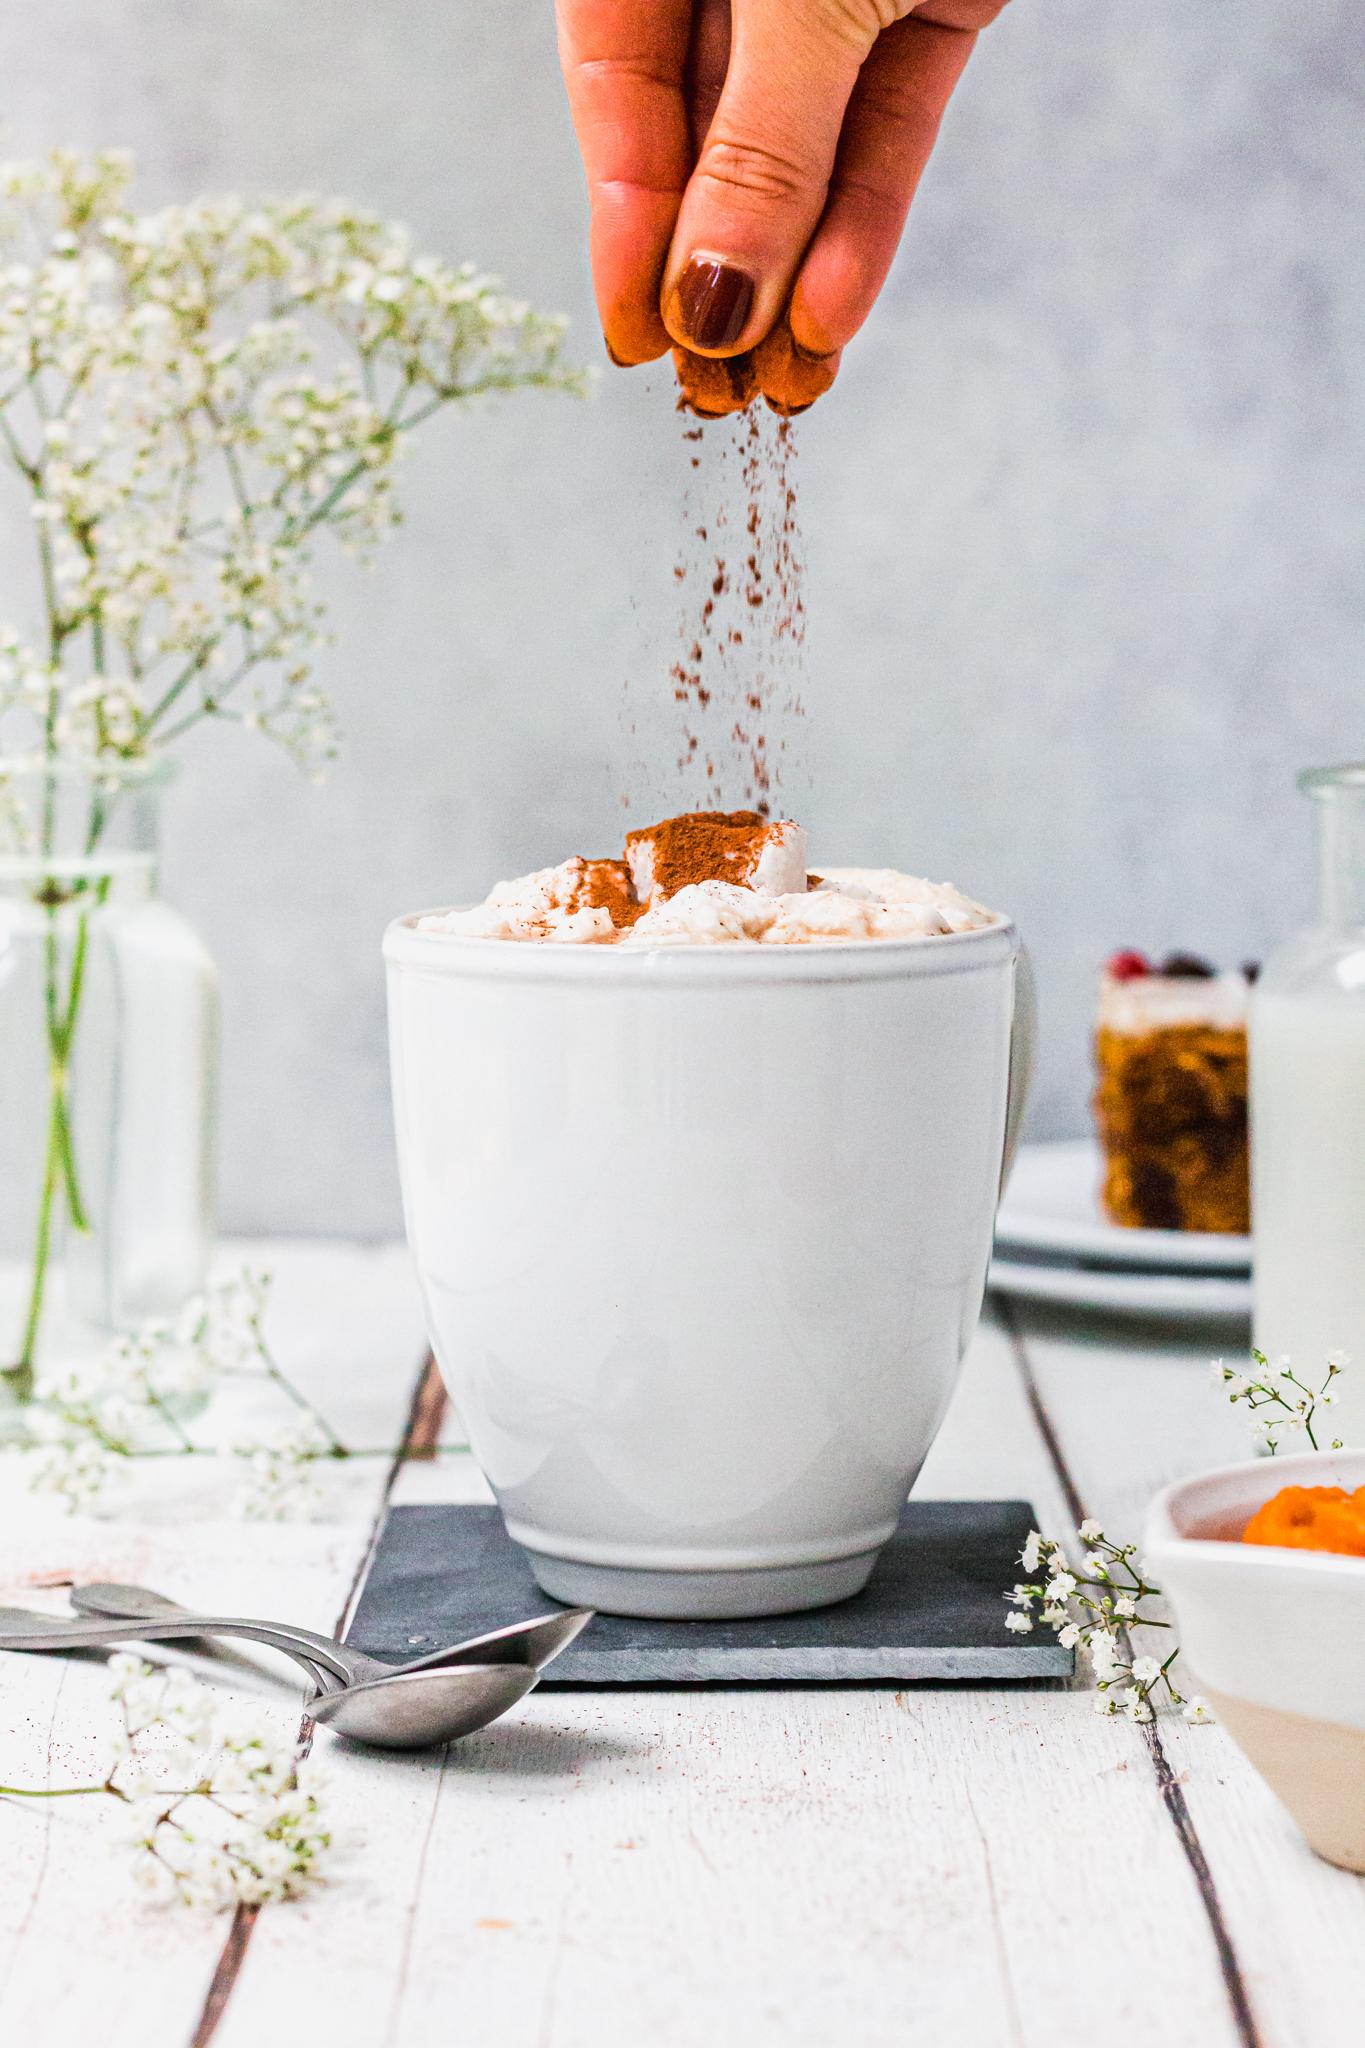 Pumpkin-spiced latte Bybrook mug